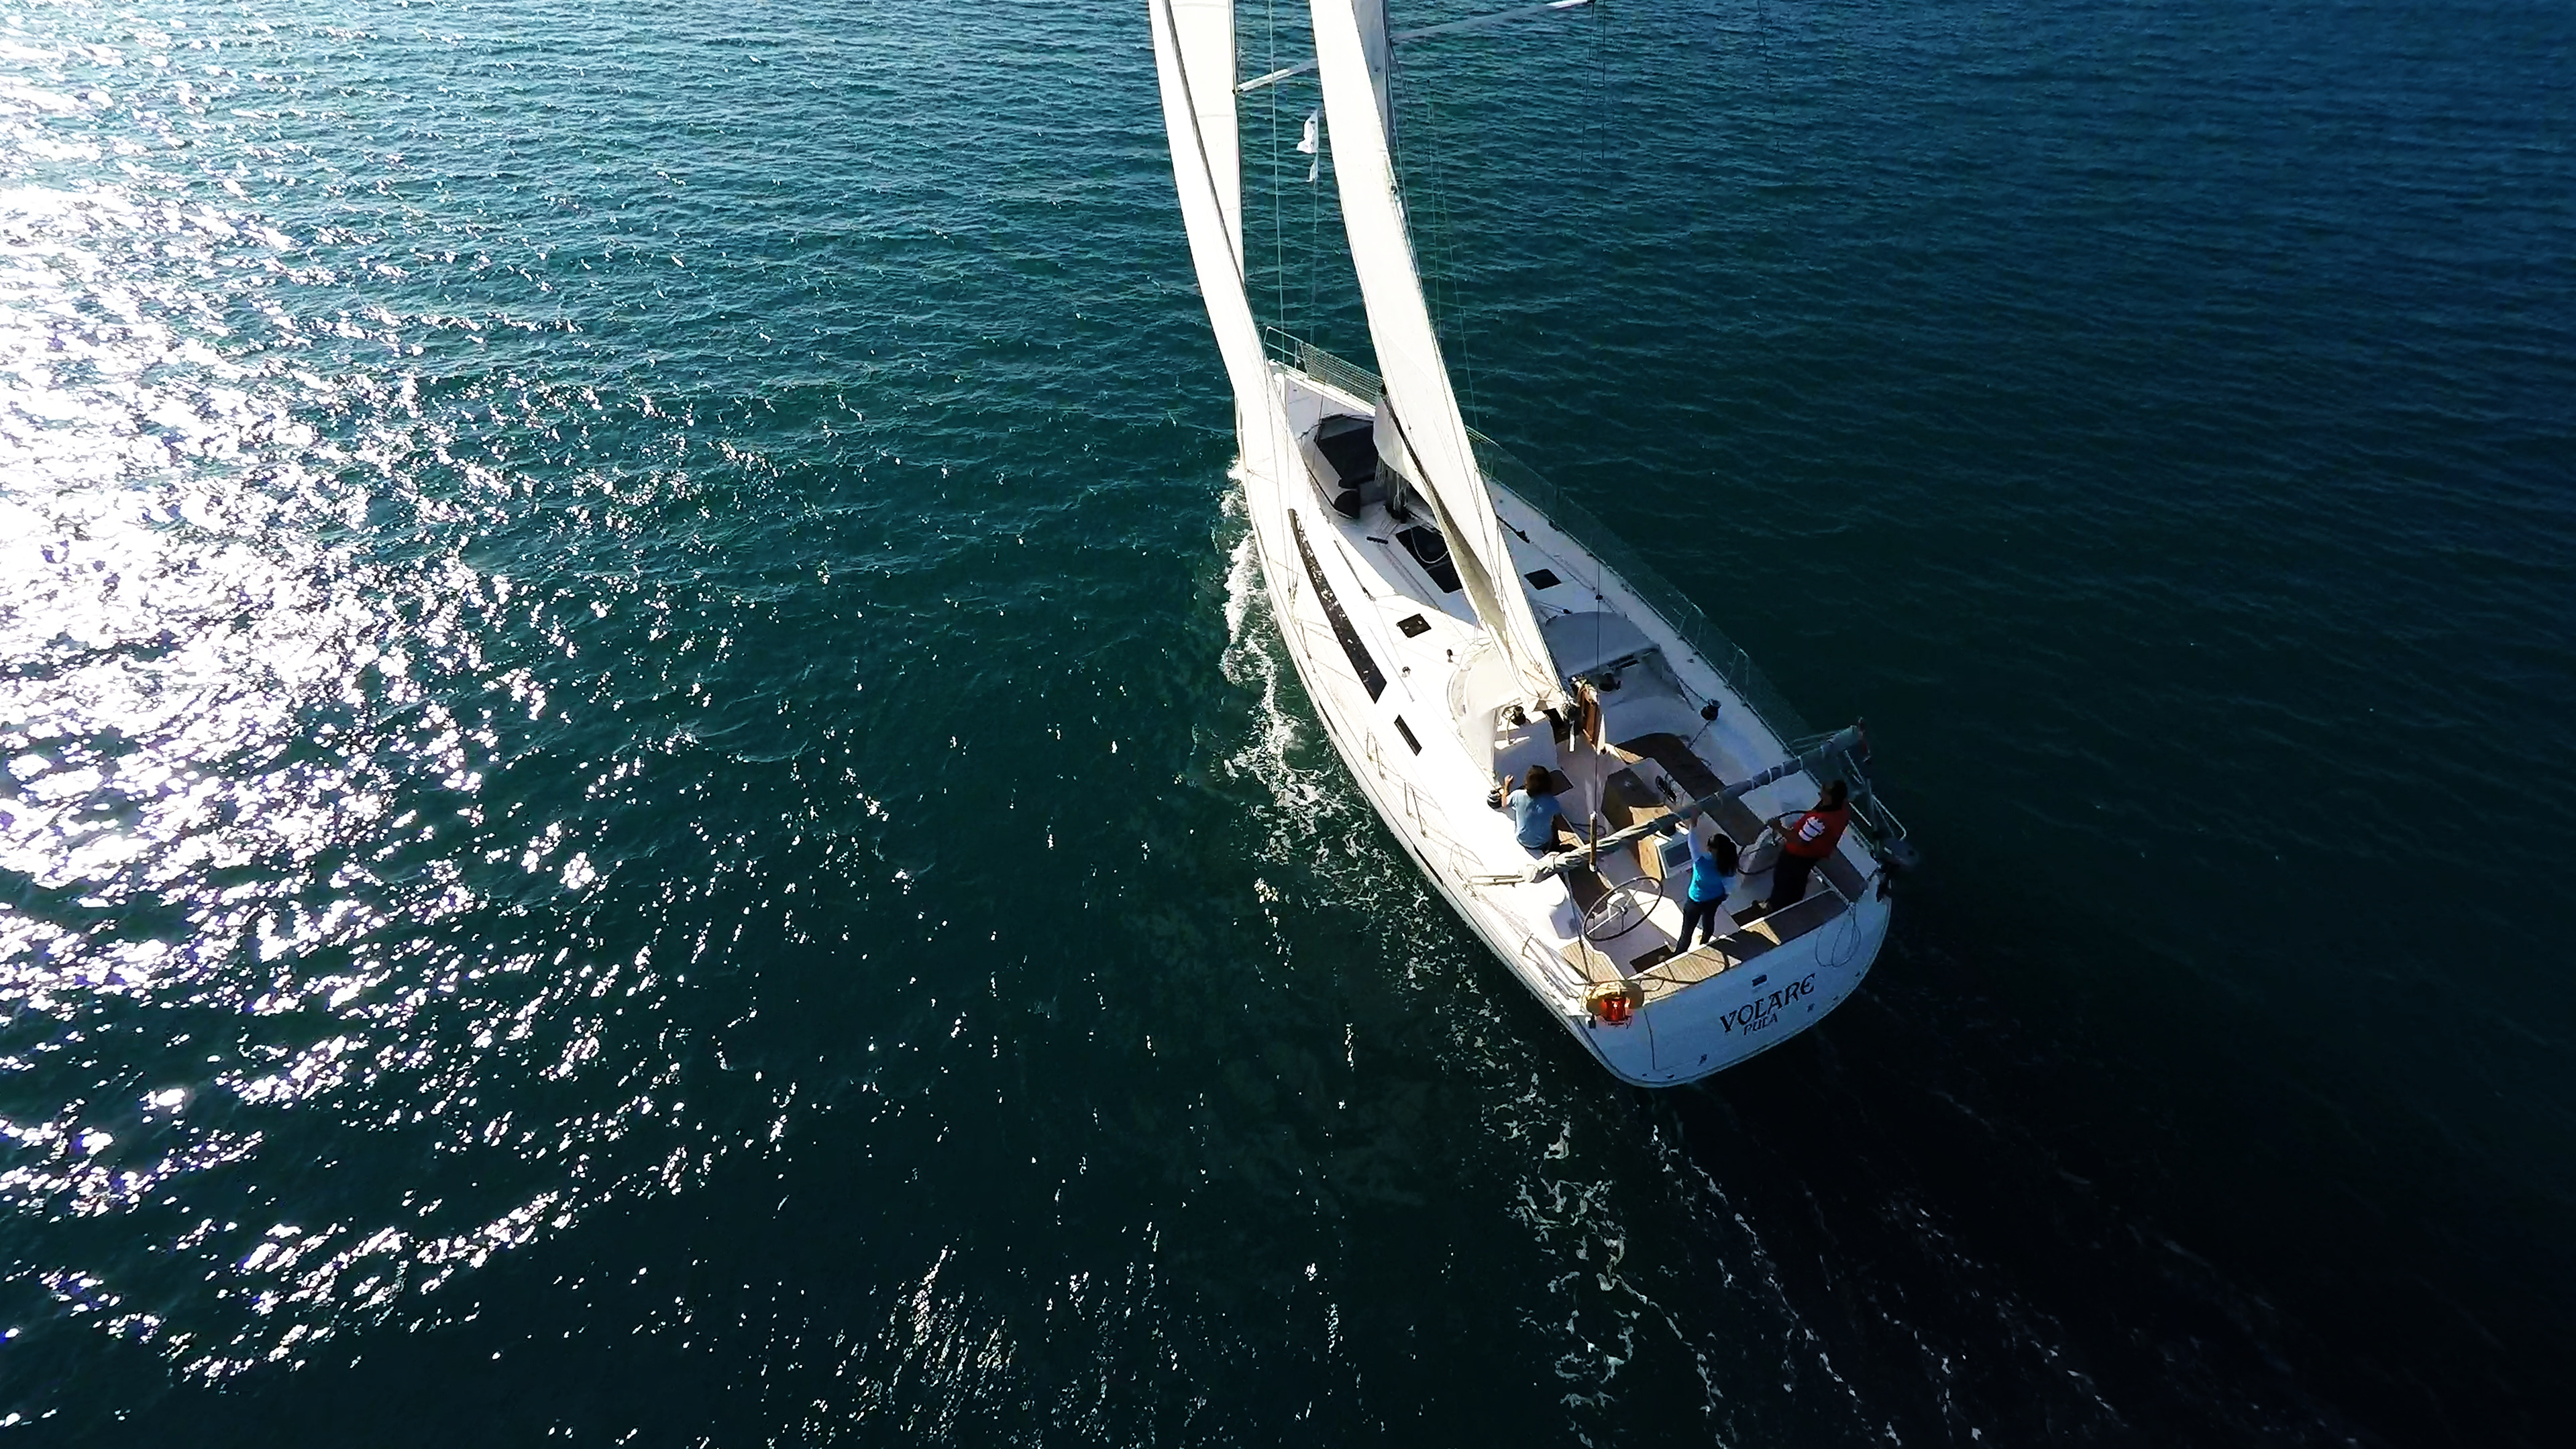 barcha a vela bavaria 46 vele della barca a vela vento mare veleggiare